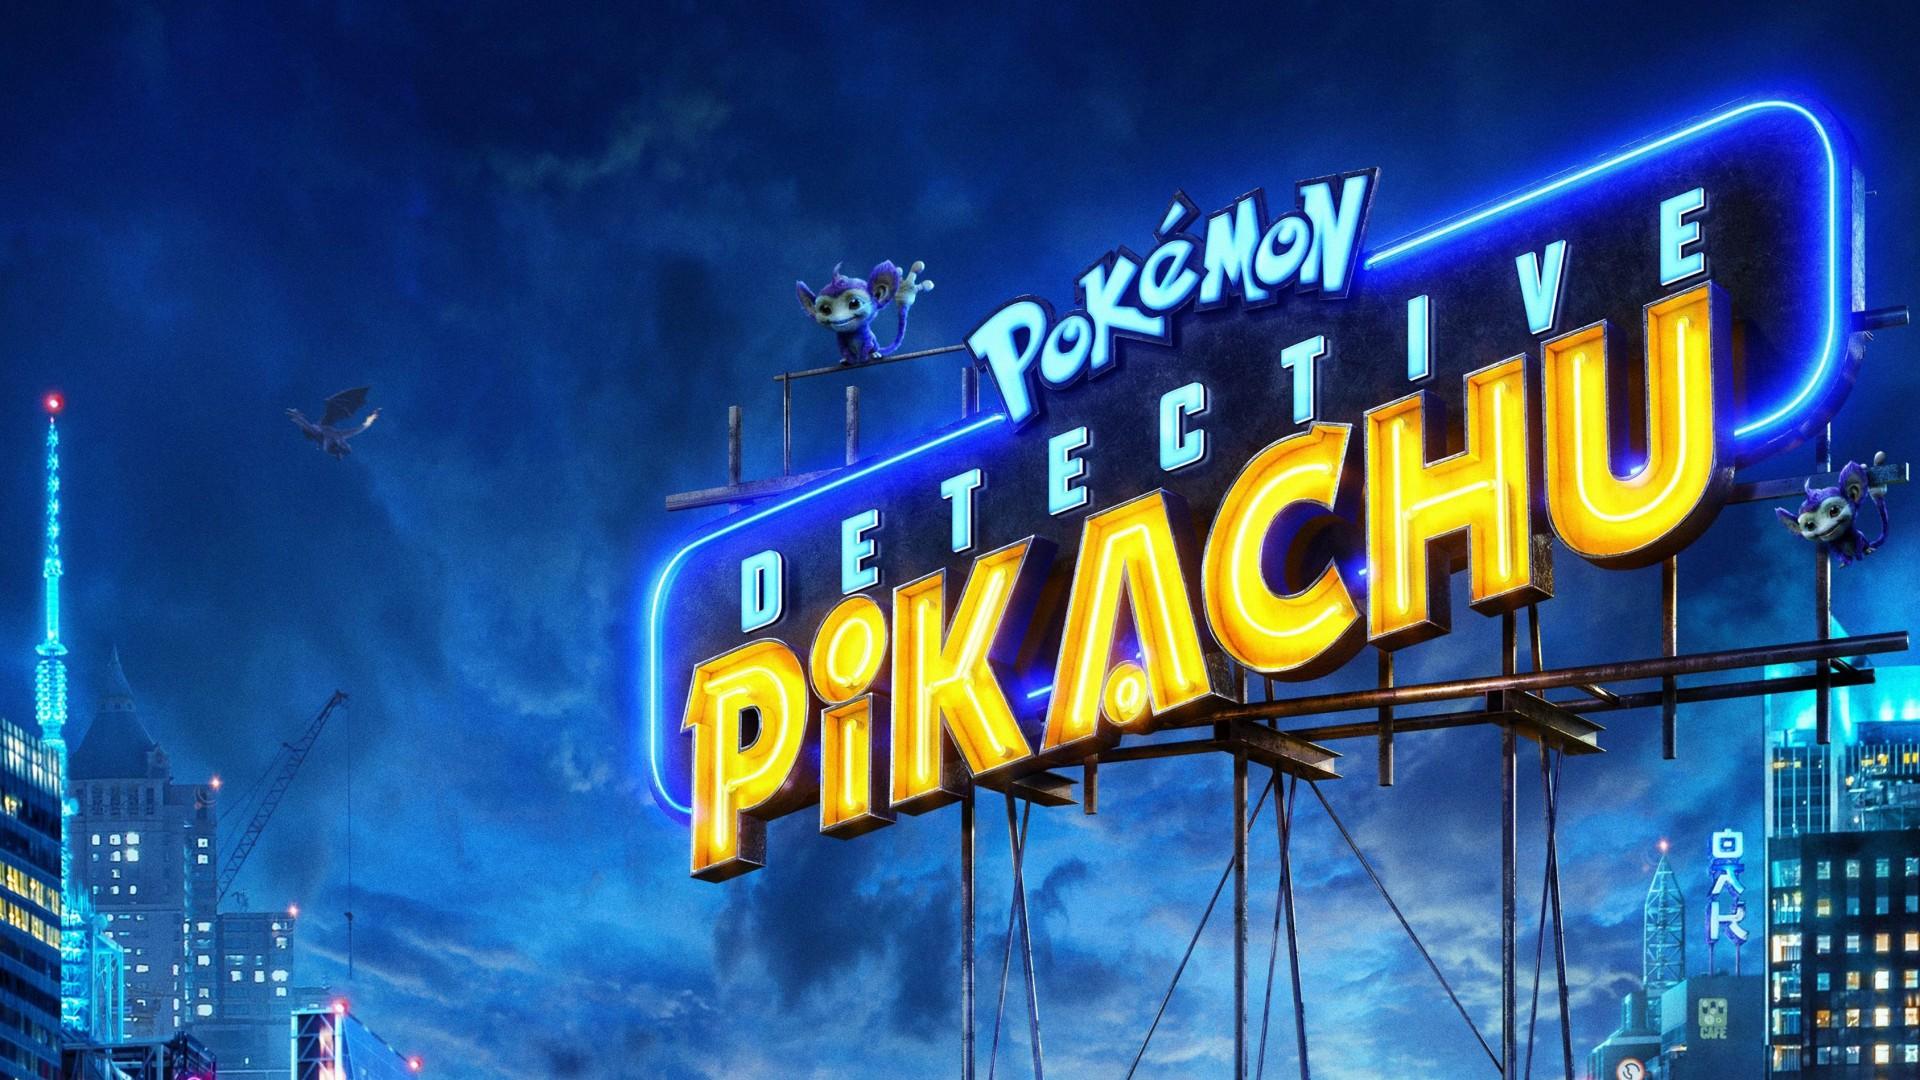 Cute Pikachu Iphone 5 Wallpaper Pok 233 Mon Detective Pikachu 2019 Wallpapers Hd Wallpapers